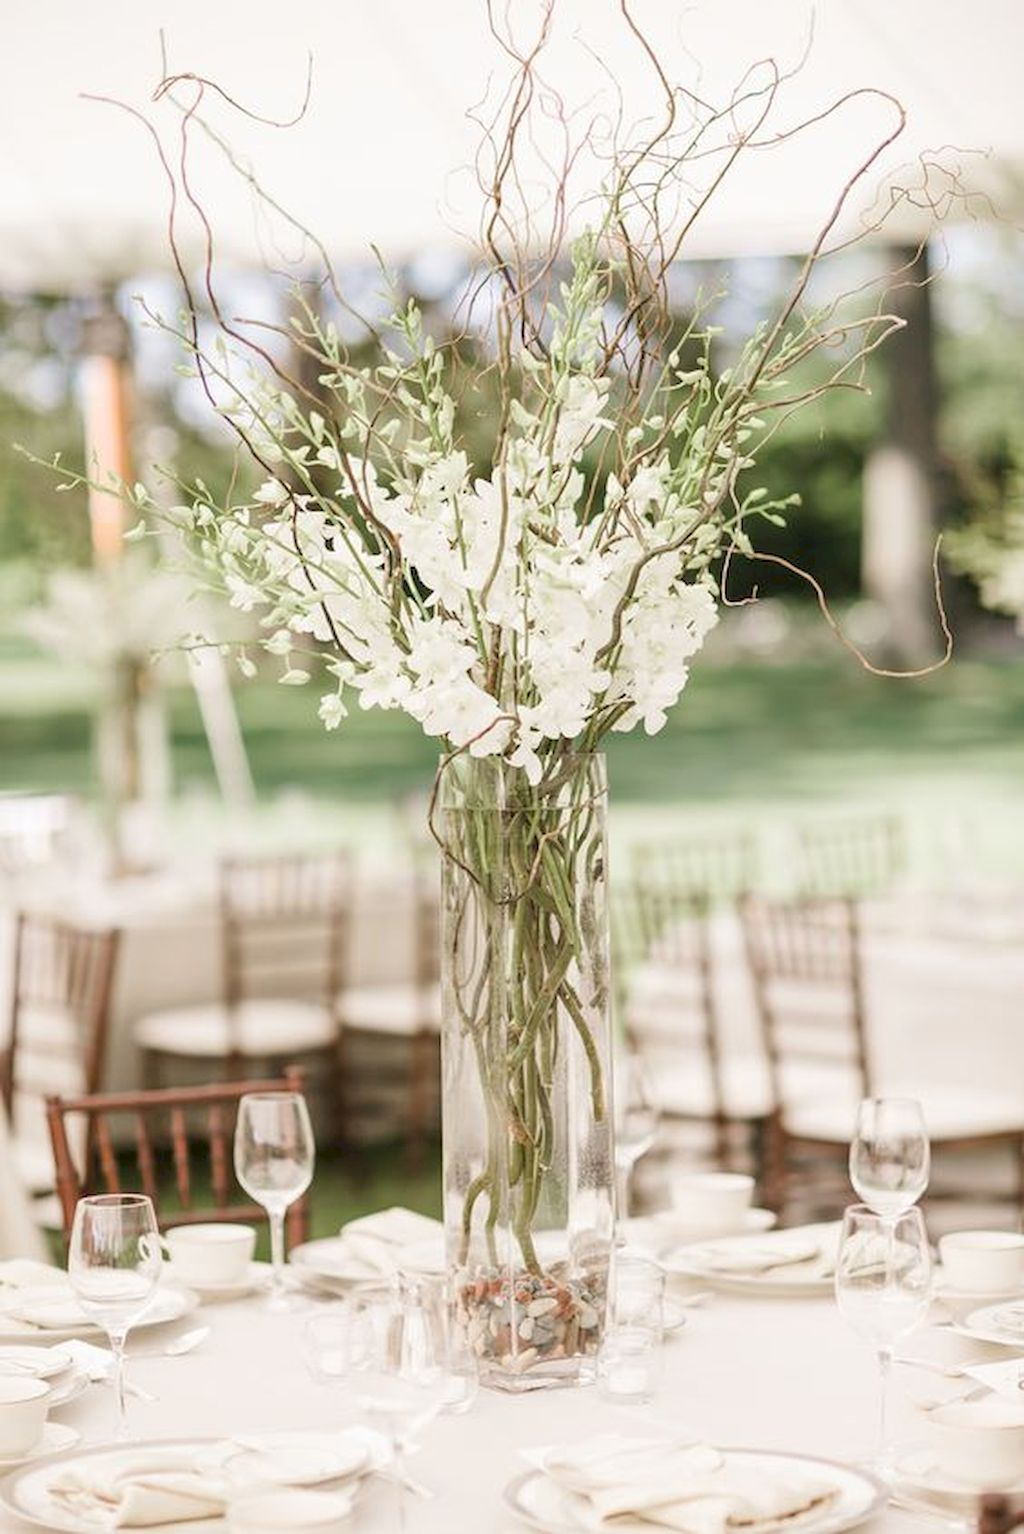 Wedding decoration ideas simple   Simple Greenery Wedding Centerpieces Ideas  Wedding centerpieces